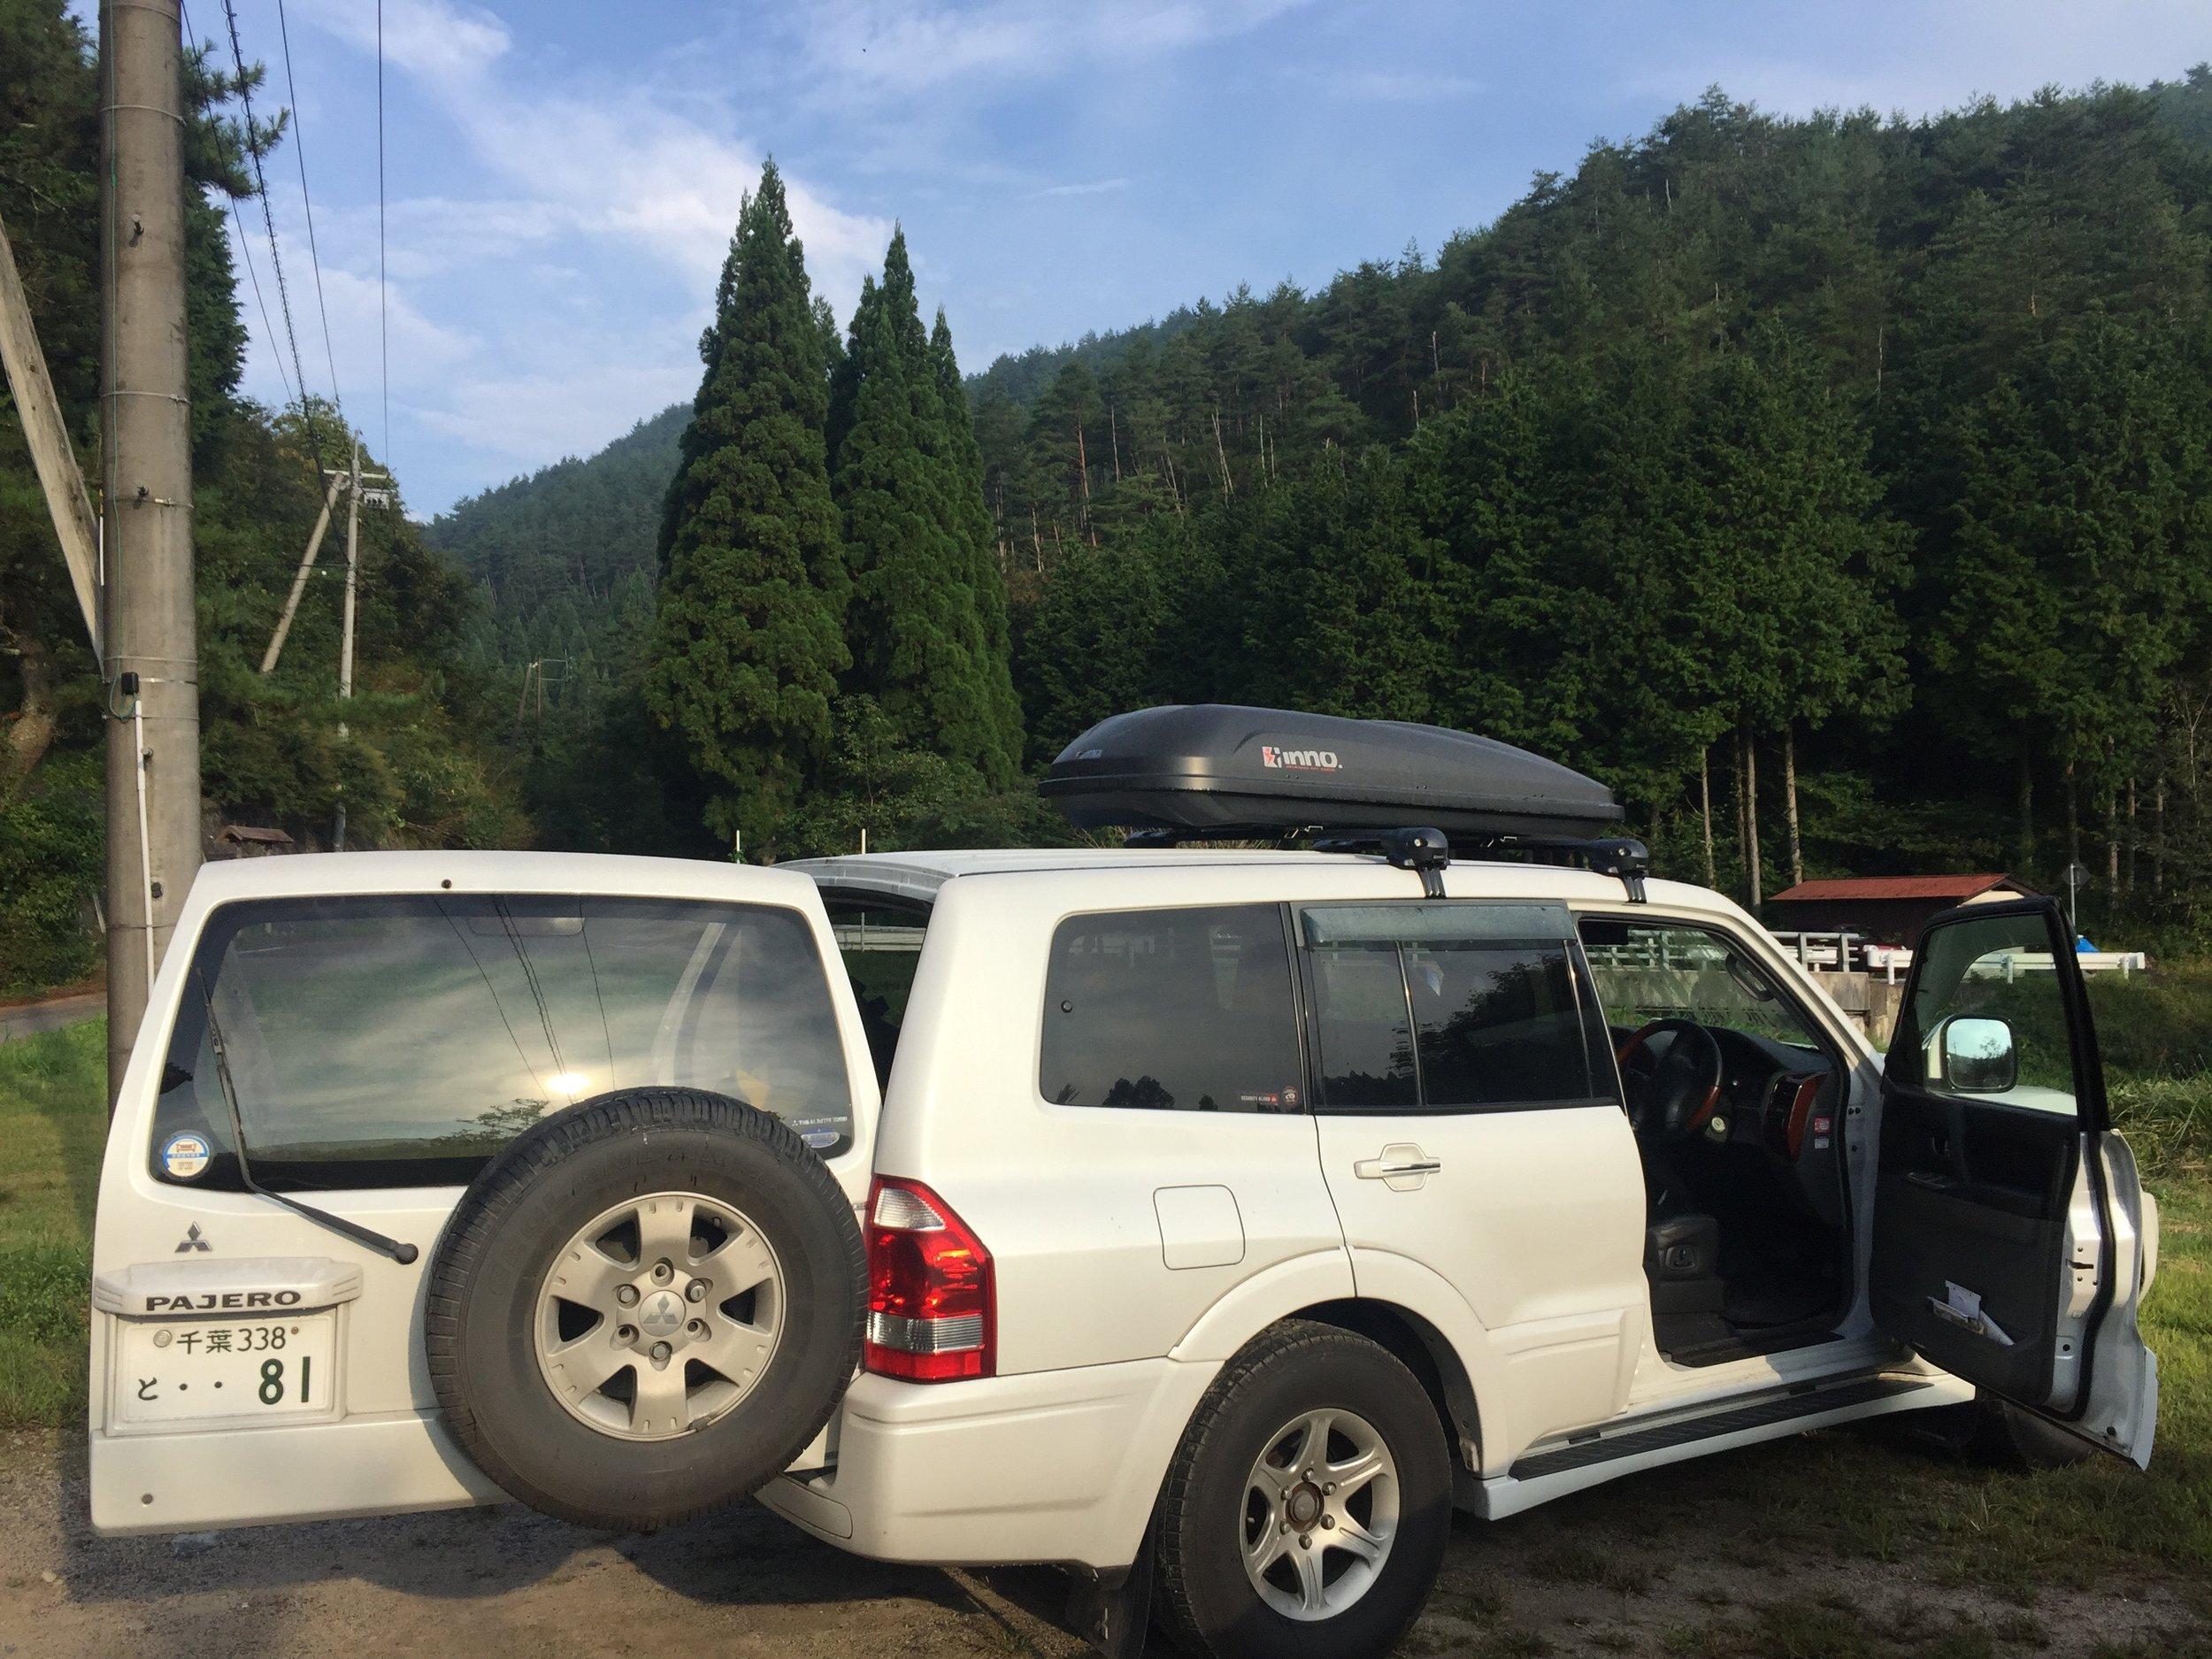 5 Seater Mitsubishi Pajero SUV